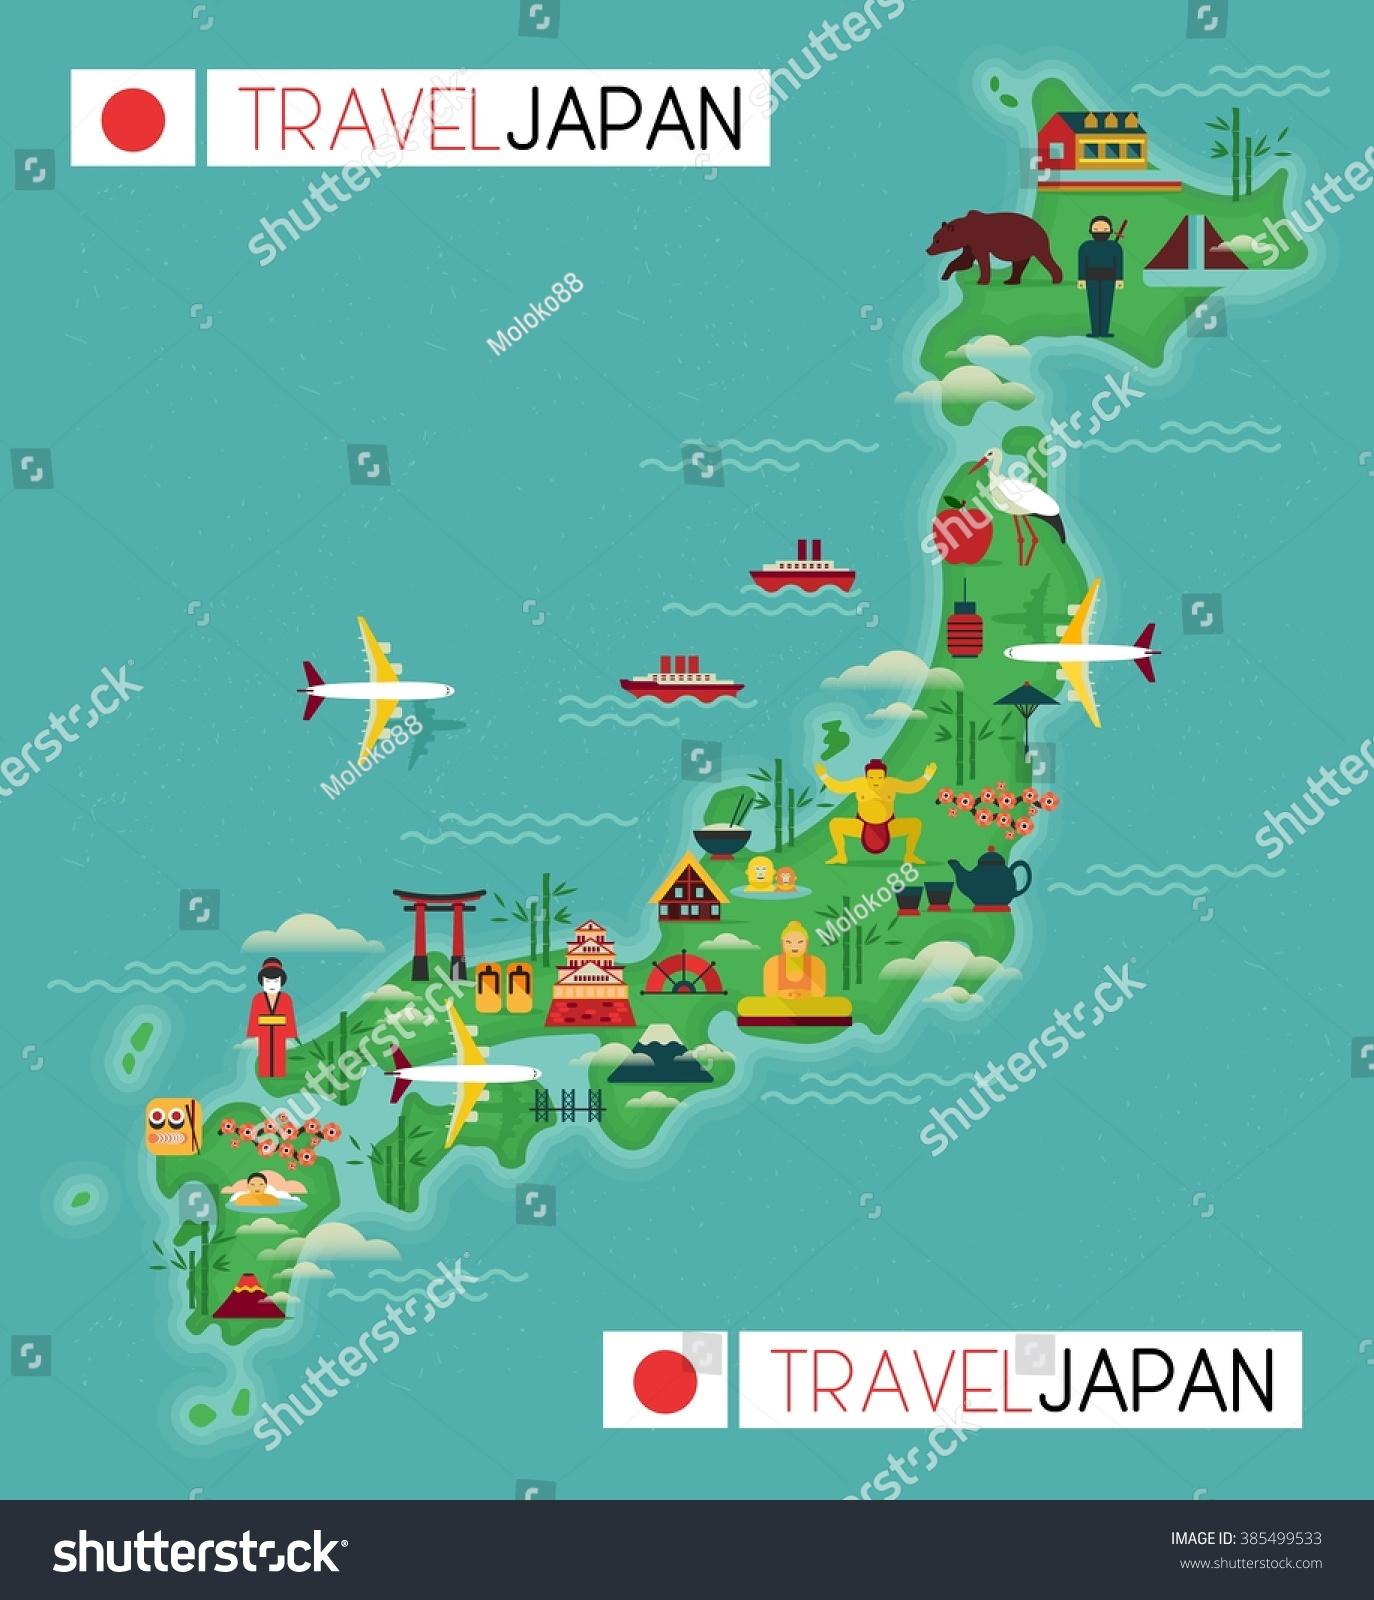 Royaltyfree Travel Map Of Japan Stock Photo Avopixcom - Japan map free